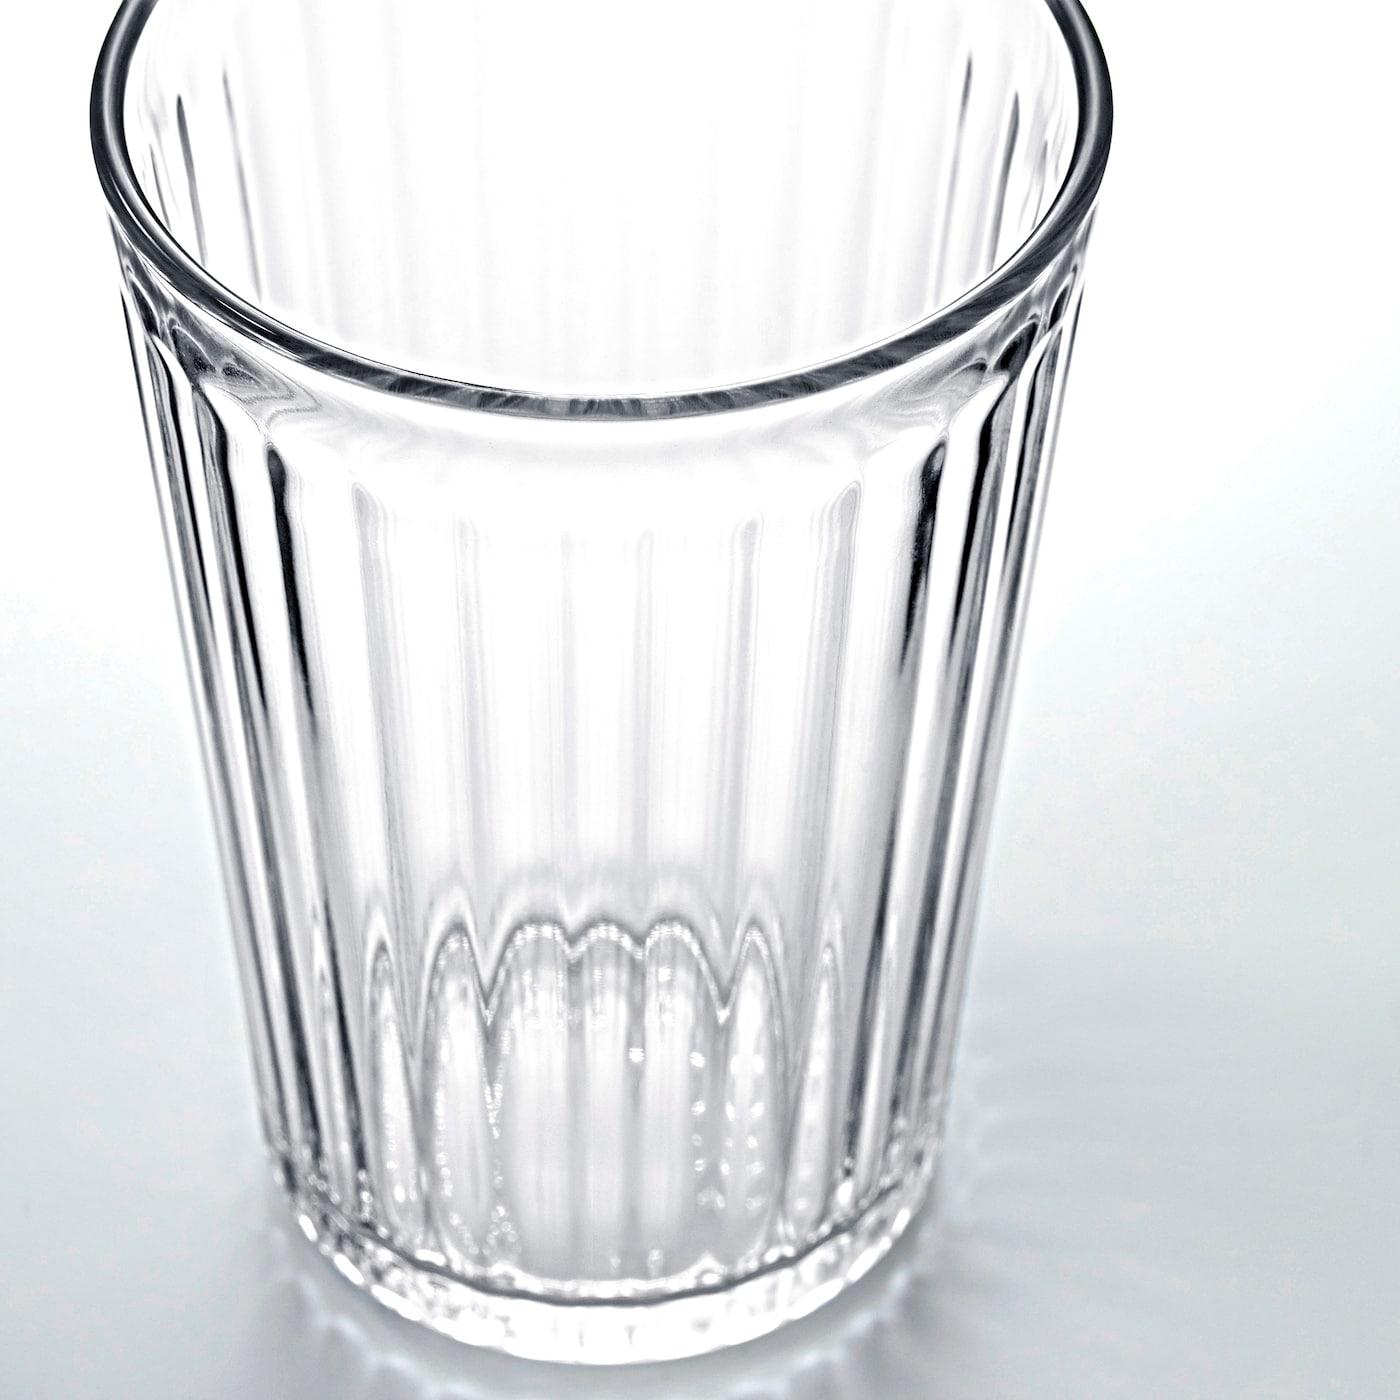 VARDAGEN Glass, clear glass, 10 oz